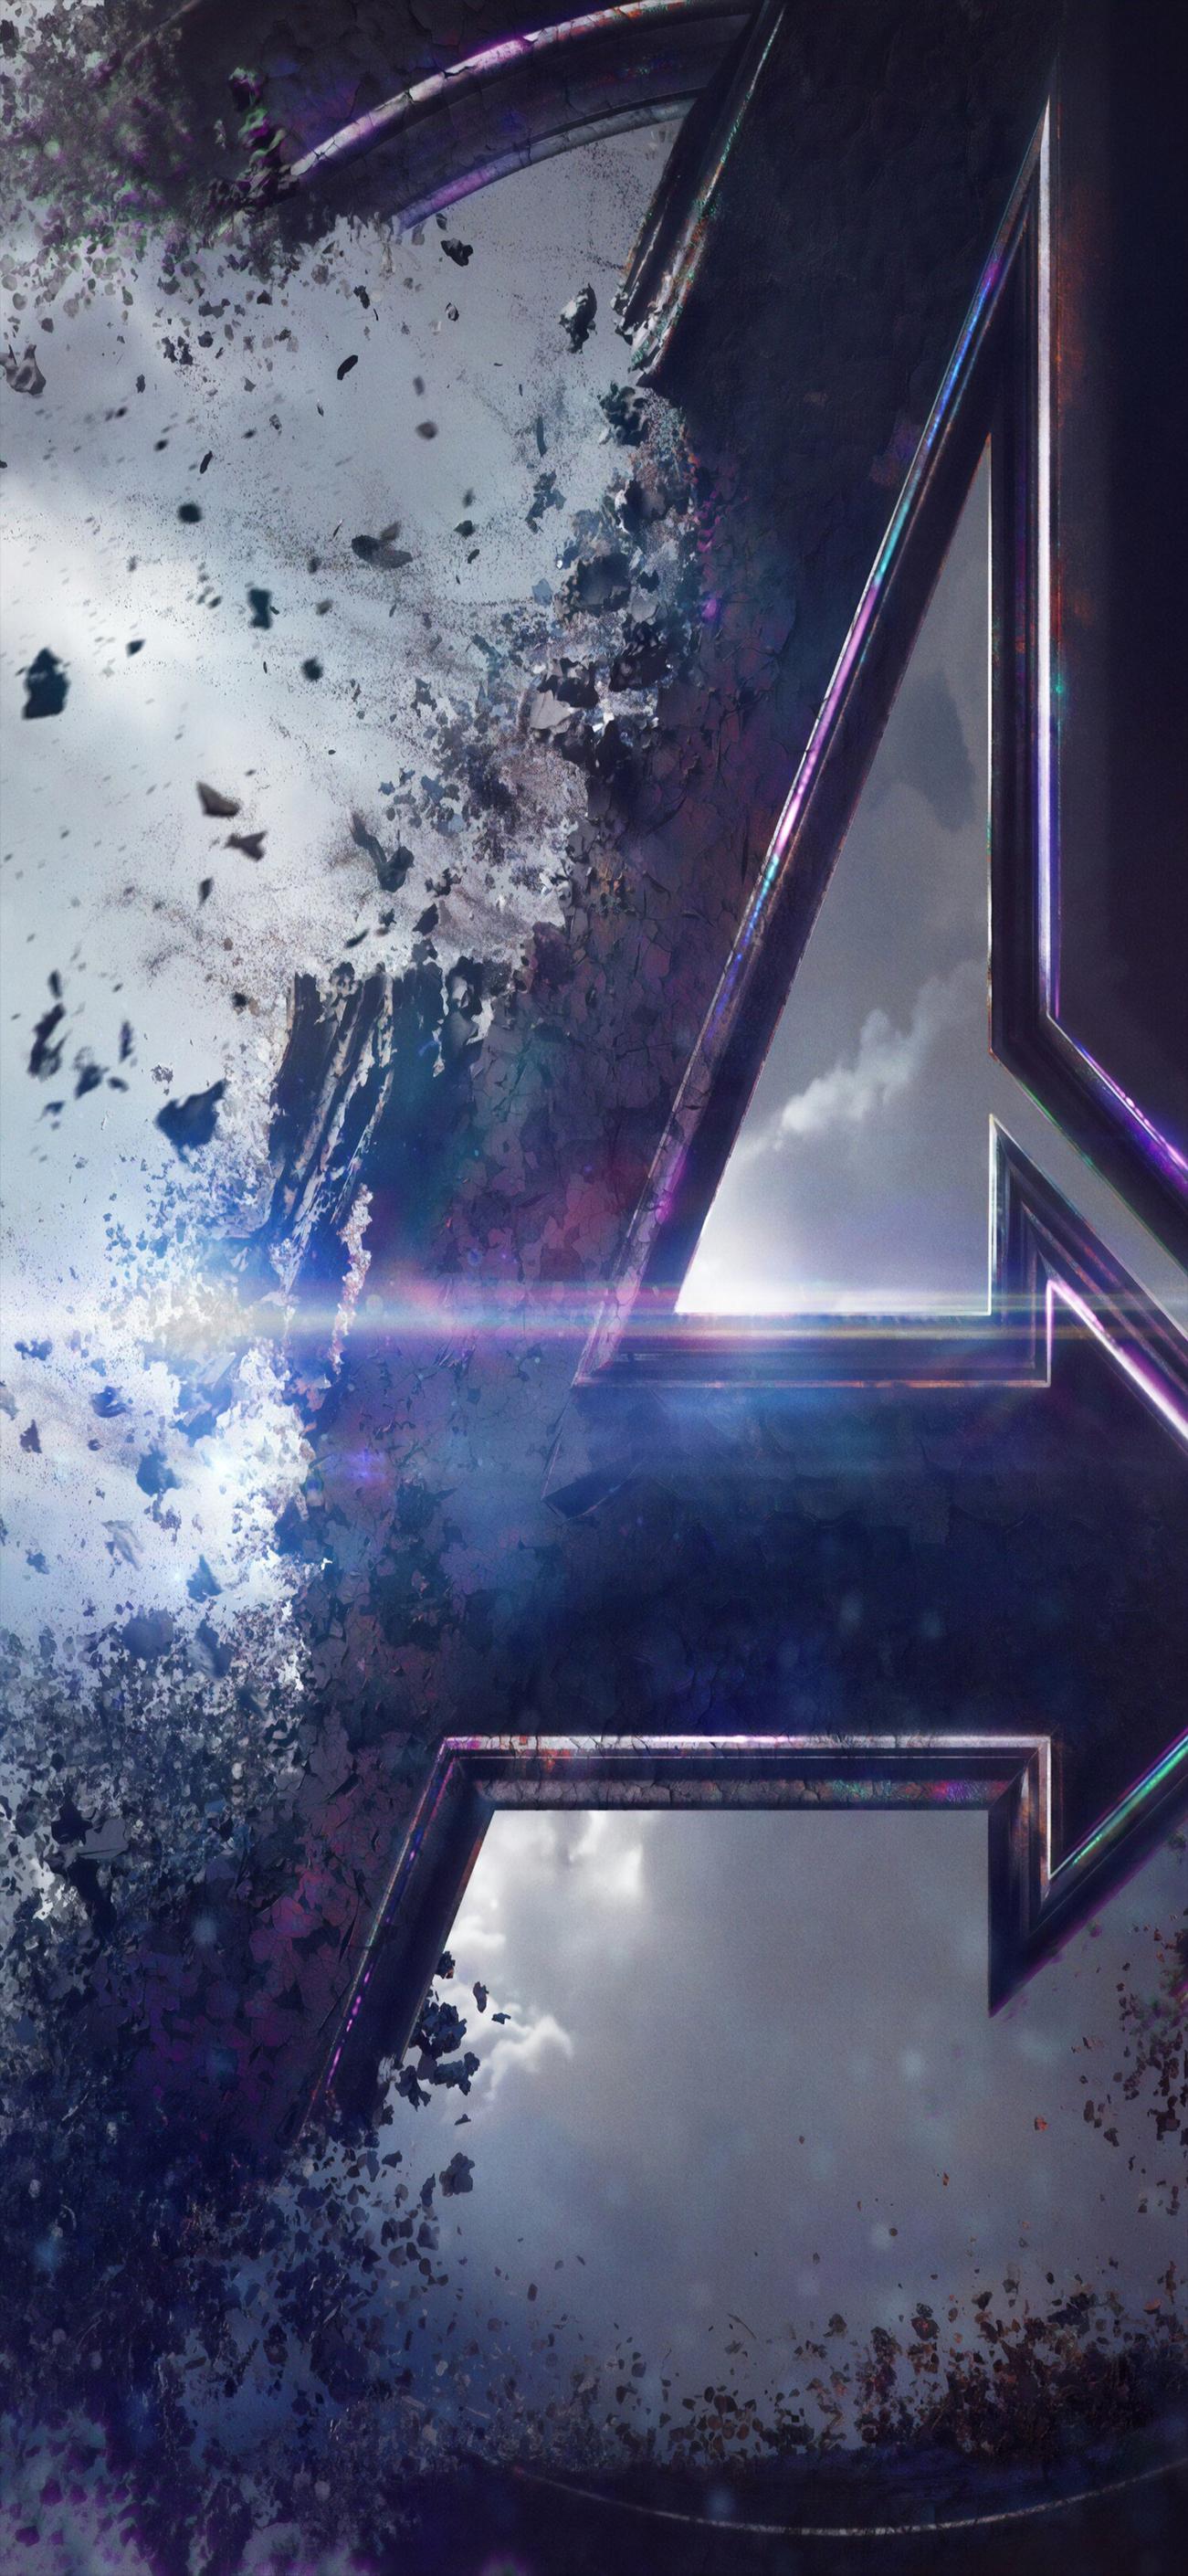 5000 Wallpaper Avengers Iphone Xs  Gratis